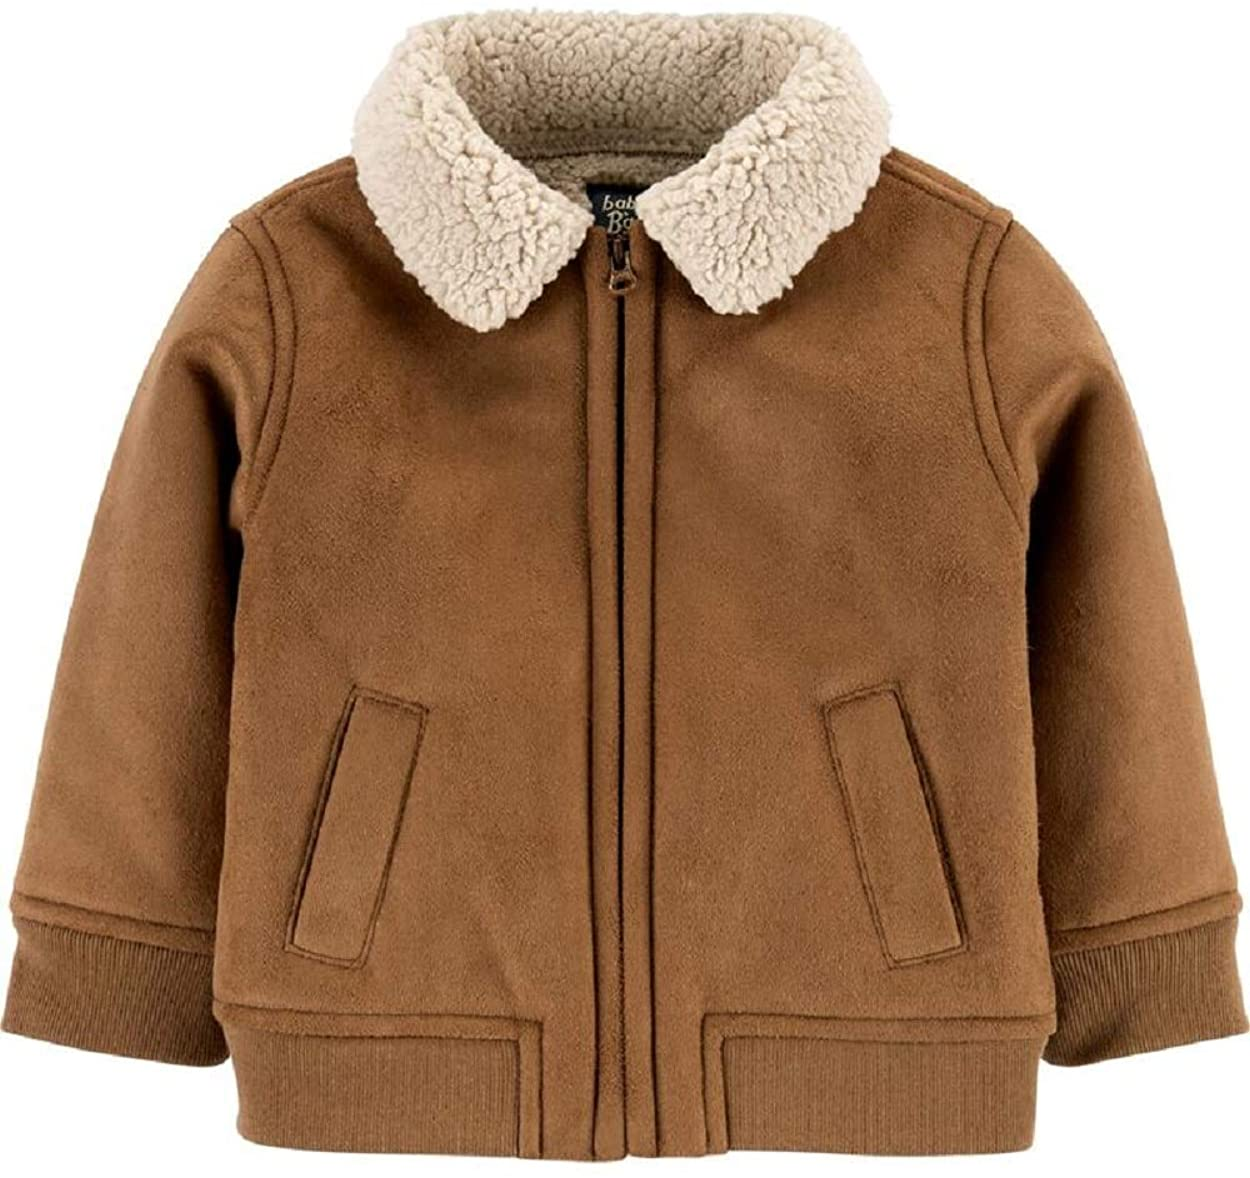 OshKosh B'Gosh Baby Soft Faux Suede Poodle Fleece Bomber Jacket Size 12 Months Brown, Ivory